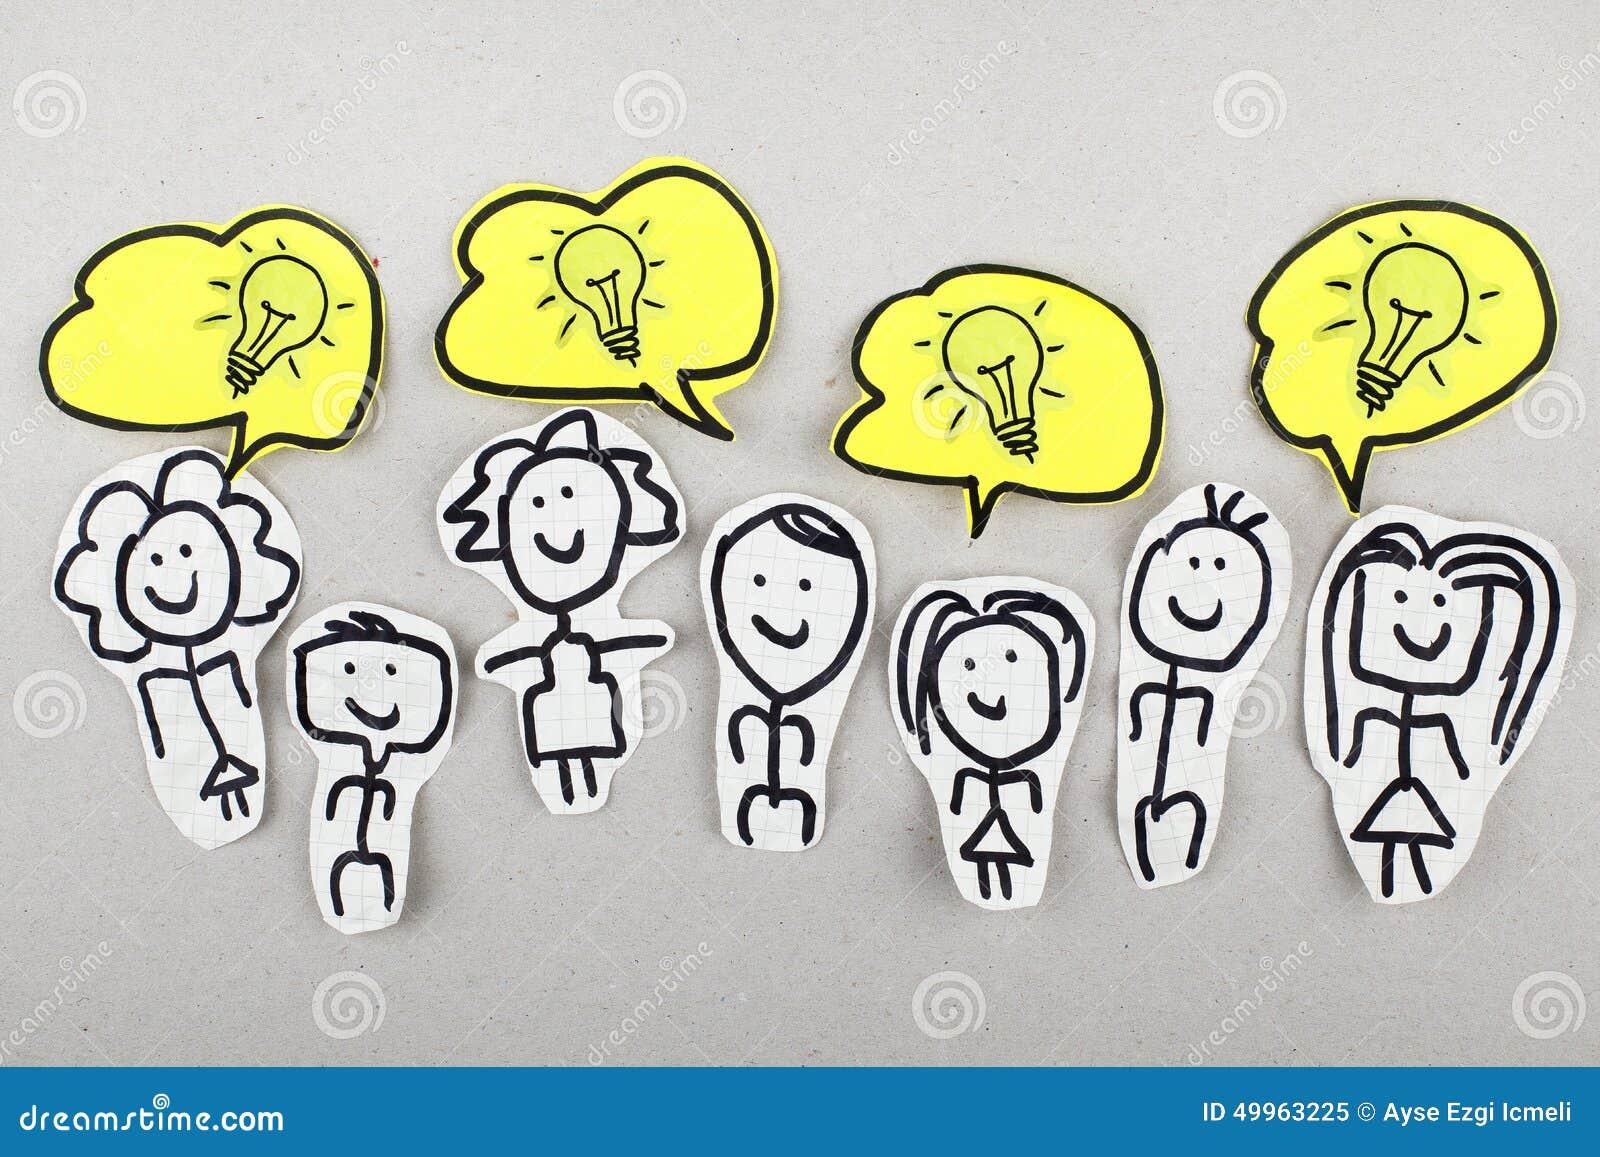 Kreative innovative Ideen stockbild. Bild von geschäft - 49963225